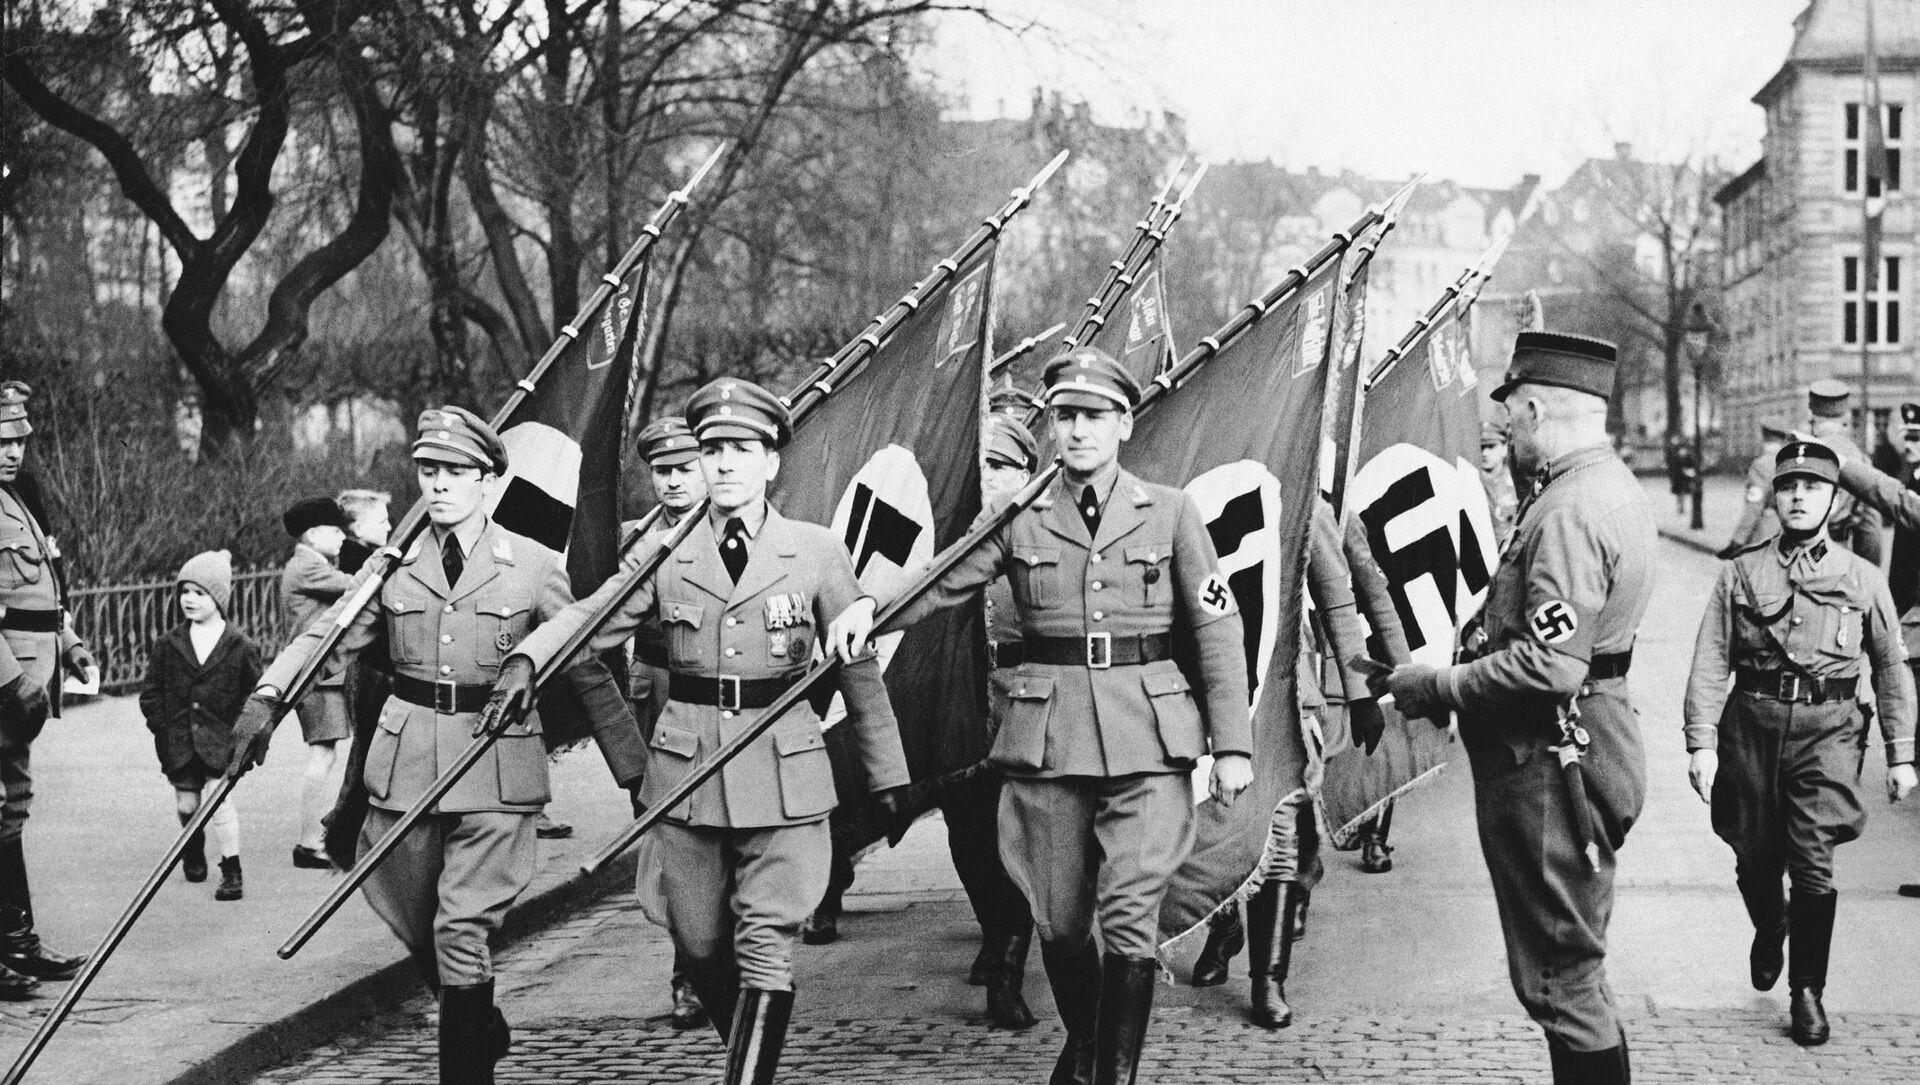 Militares nazis en 1936 - Sputnik Mundo, 1920, 16.03.2020